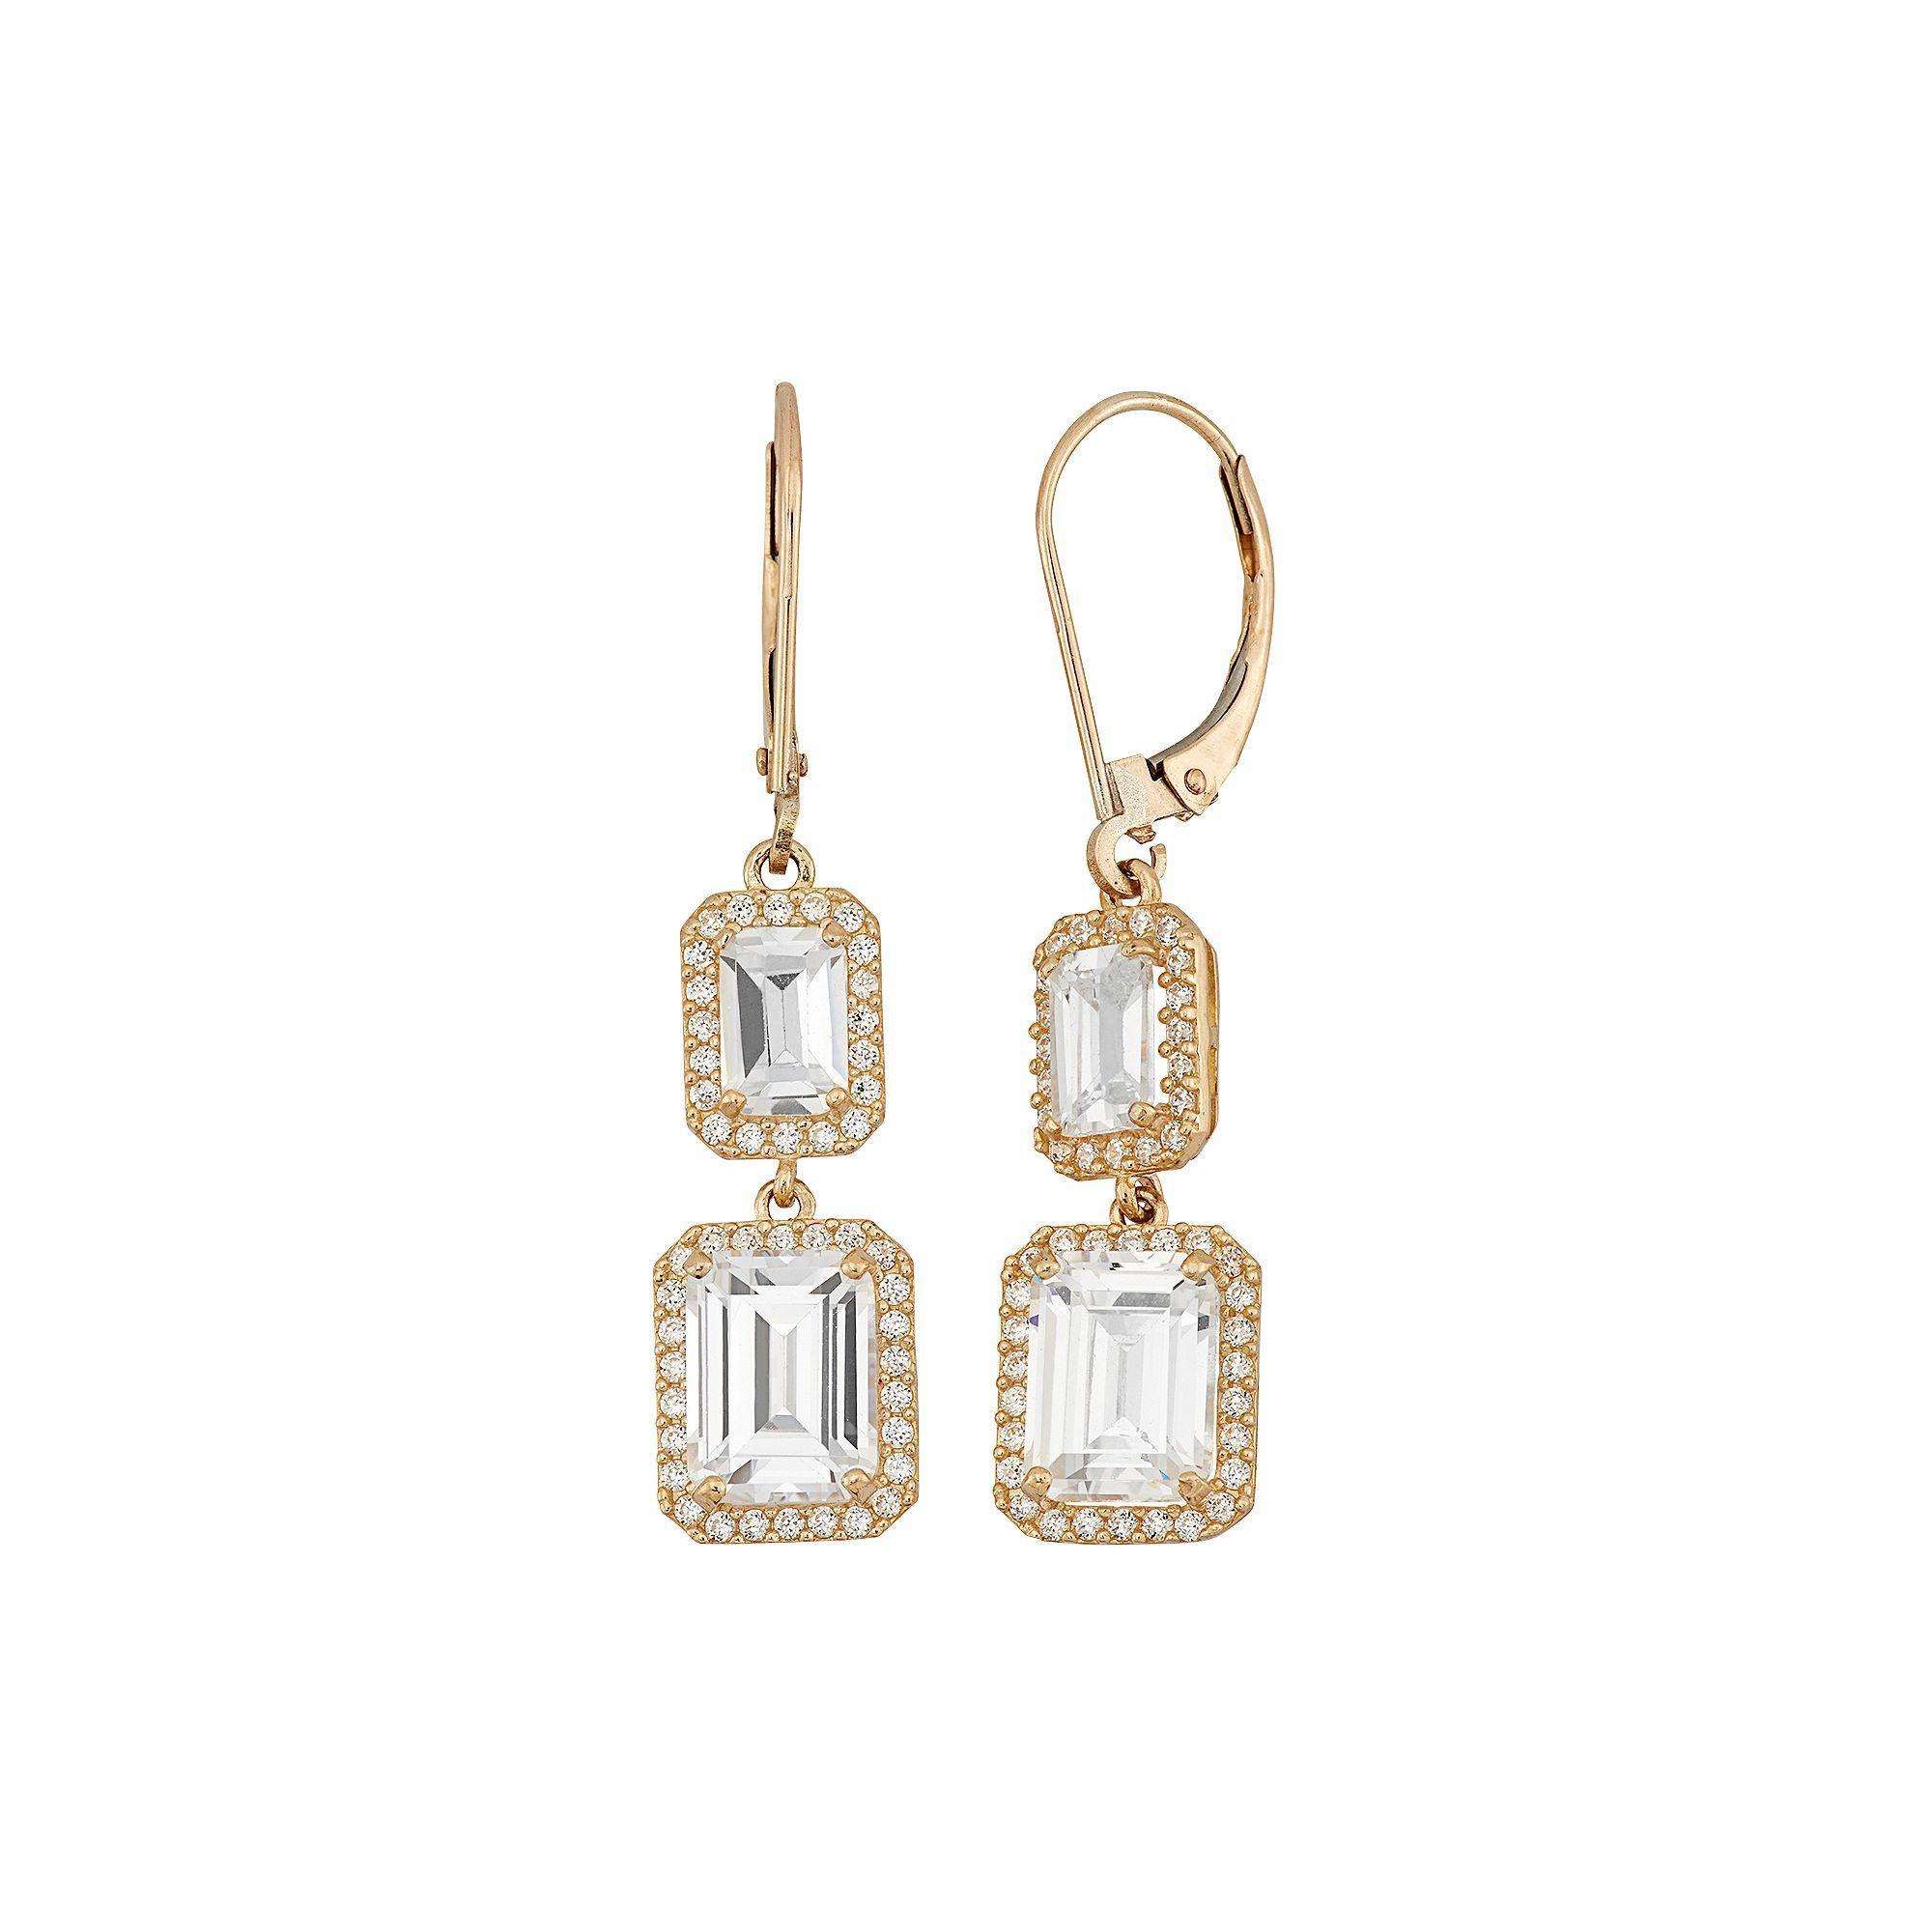 10K Gold Rectangular Drop Earrings